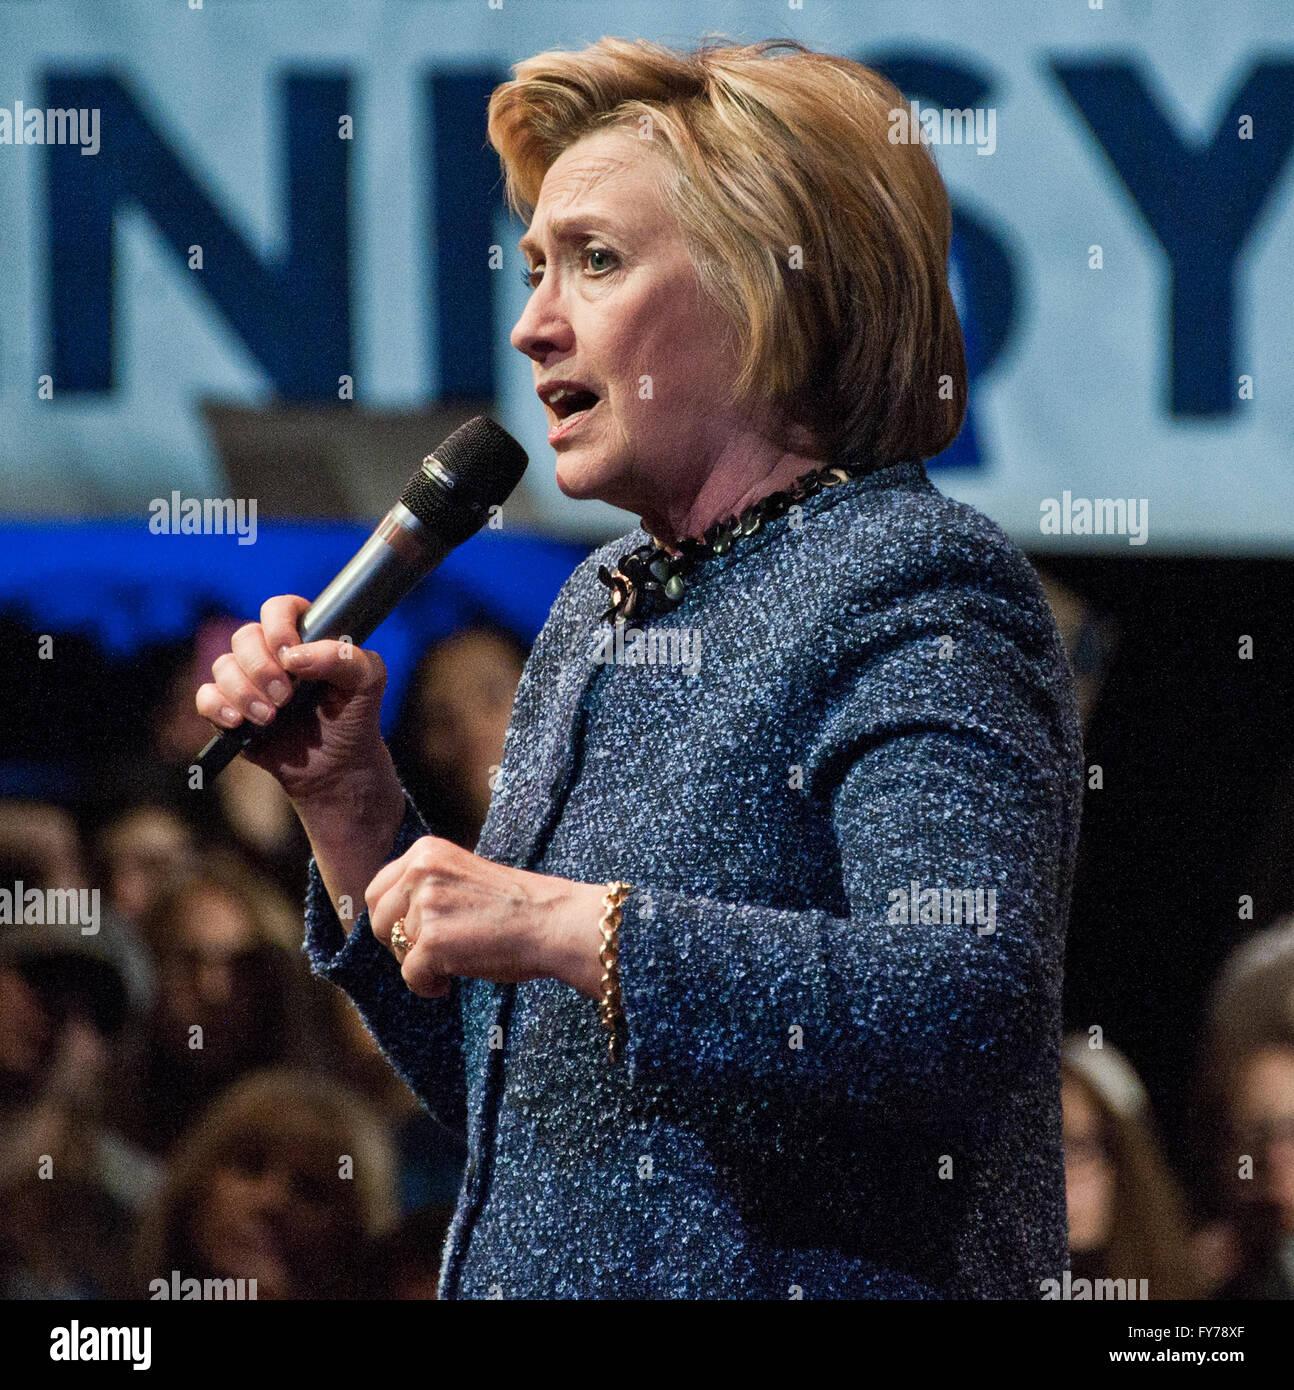 Philadelphia, PA, USA. 20 de abril, 2016. Hillary Clinton Campañas en el Fillmore. Foto de stock